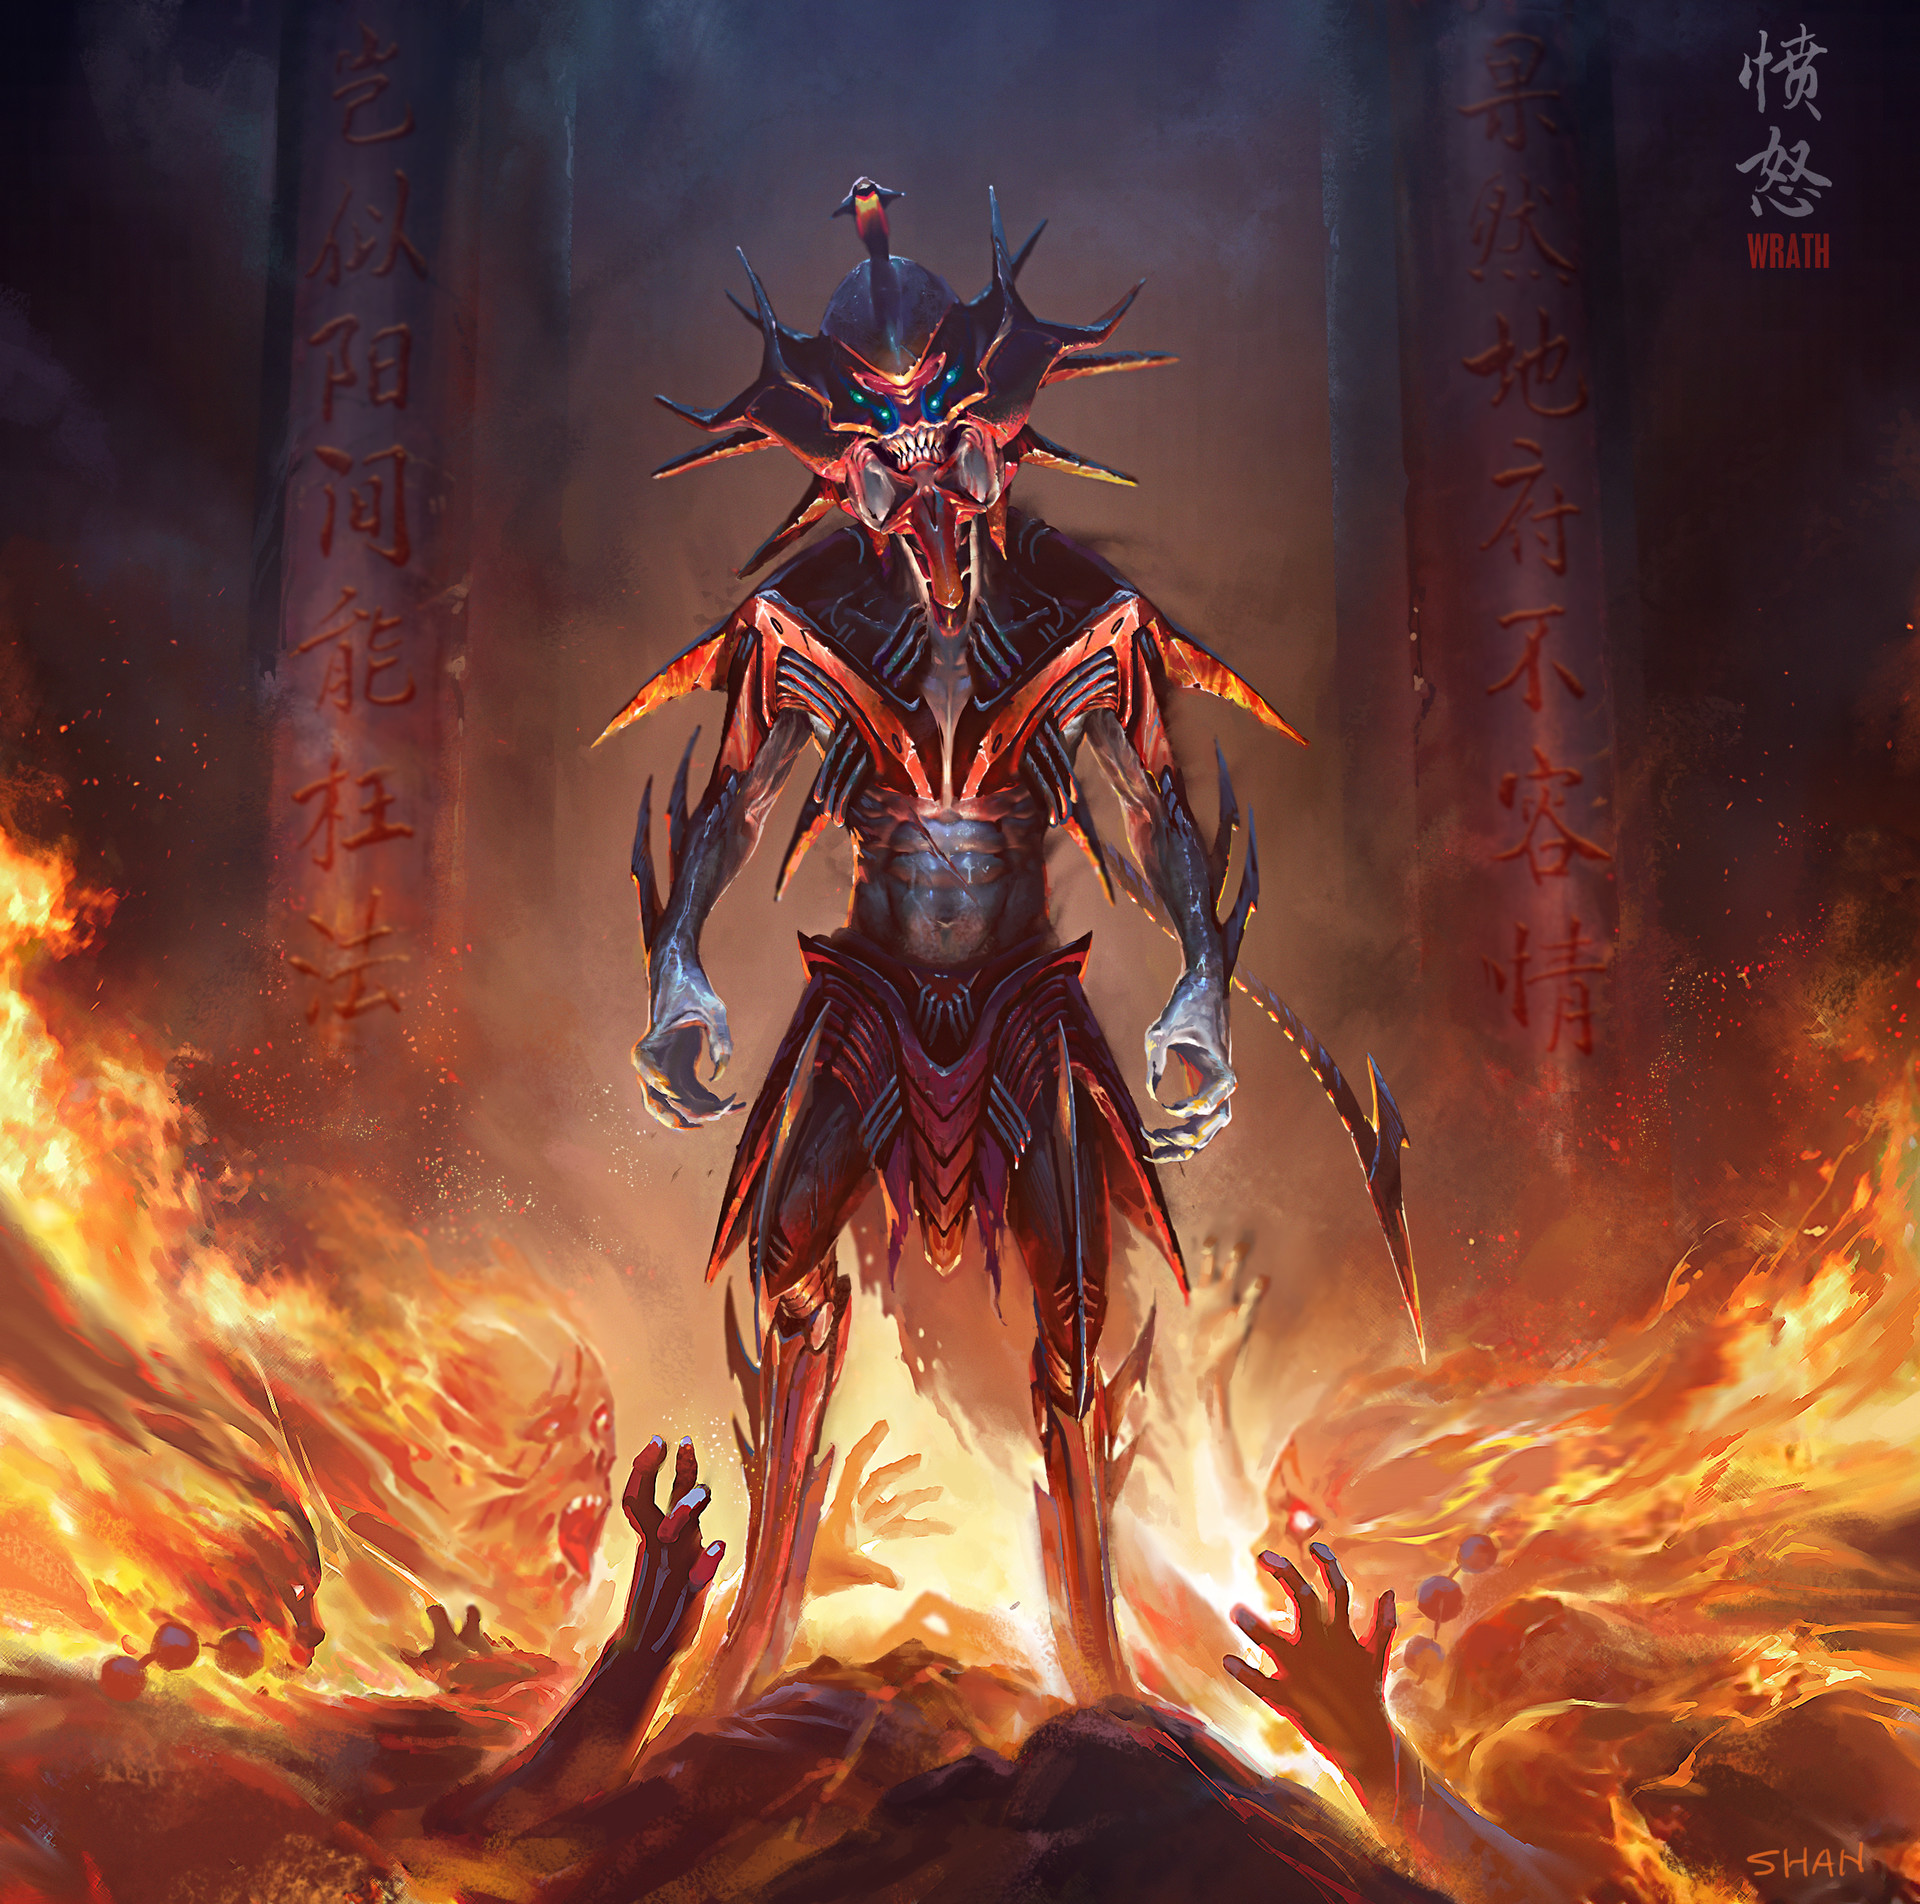 Shan qiao wrath render